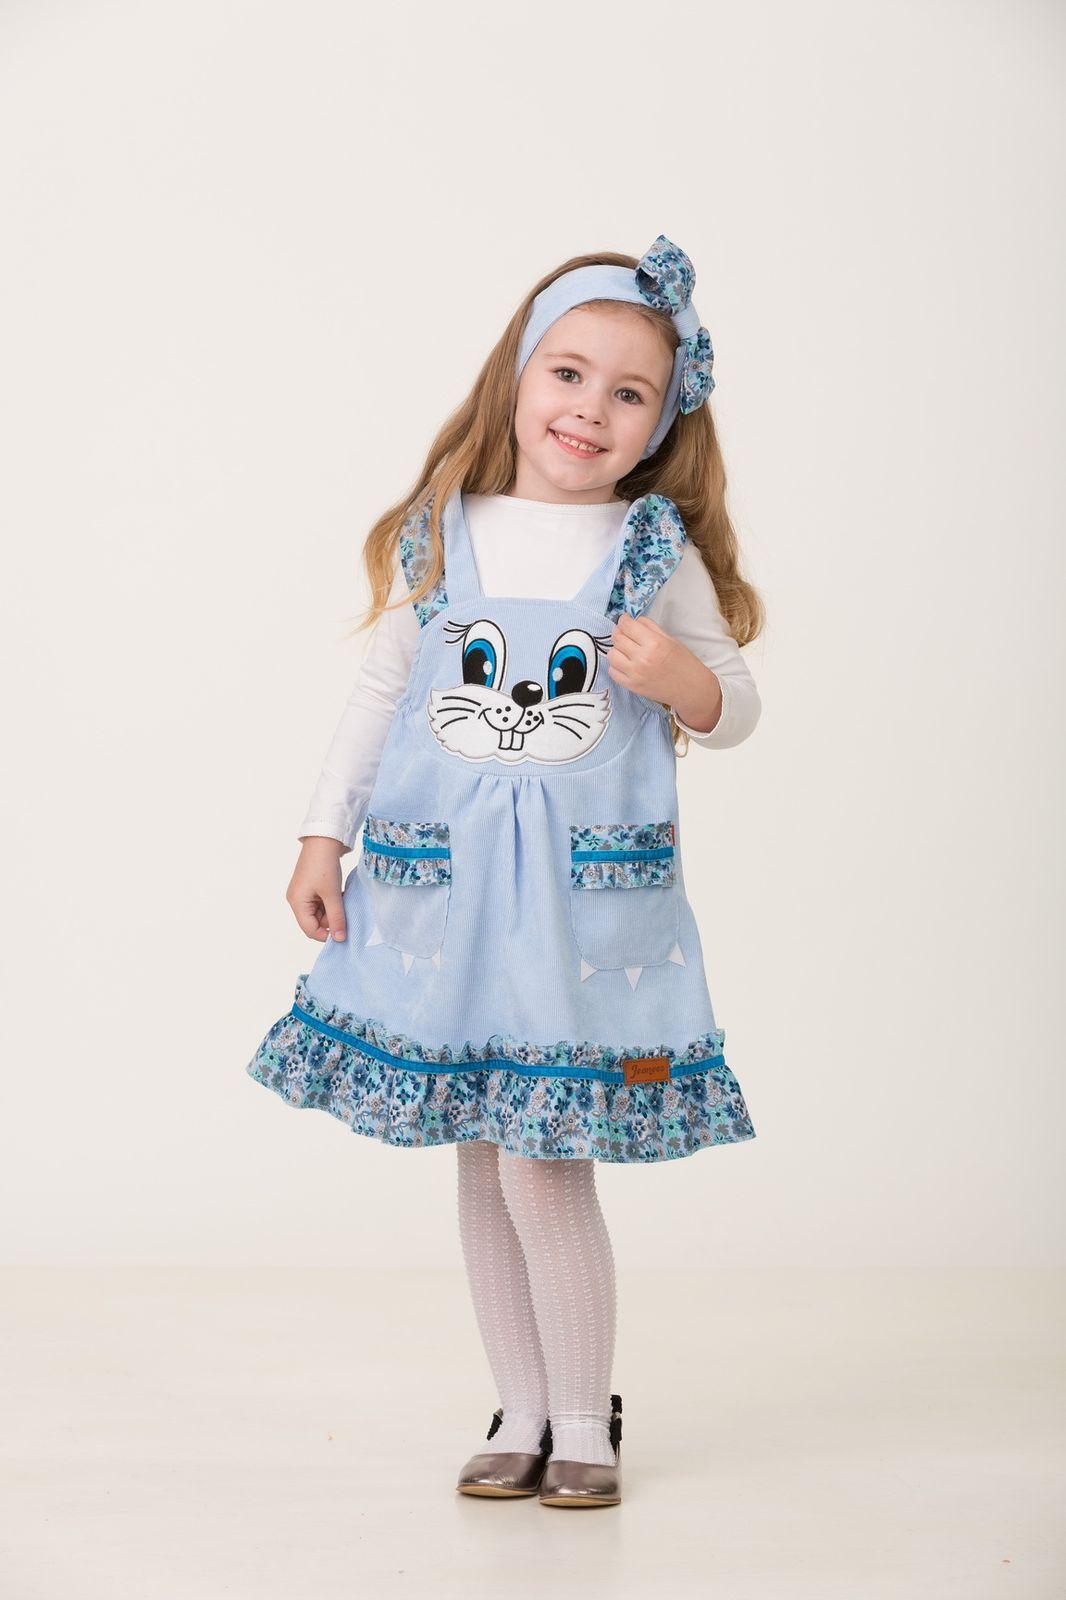 Карнавальный костюм Jeanees Зайка Капризка, цвет: голубой. Размер: 24 карнавальный костюм jeanees мышонок масик цвет серый размер 24